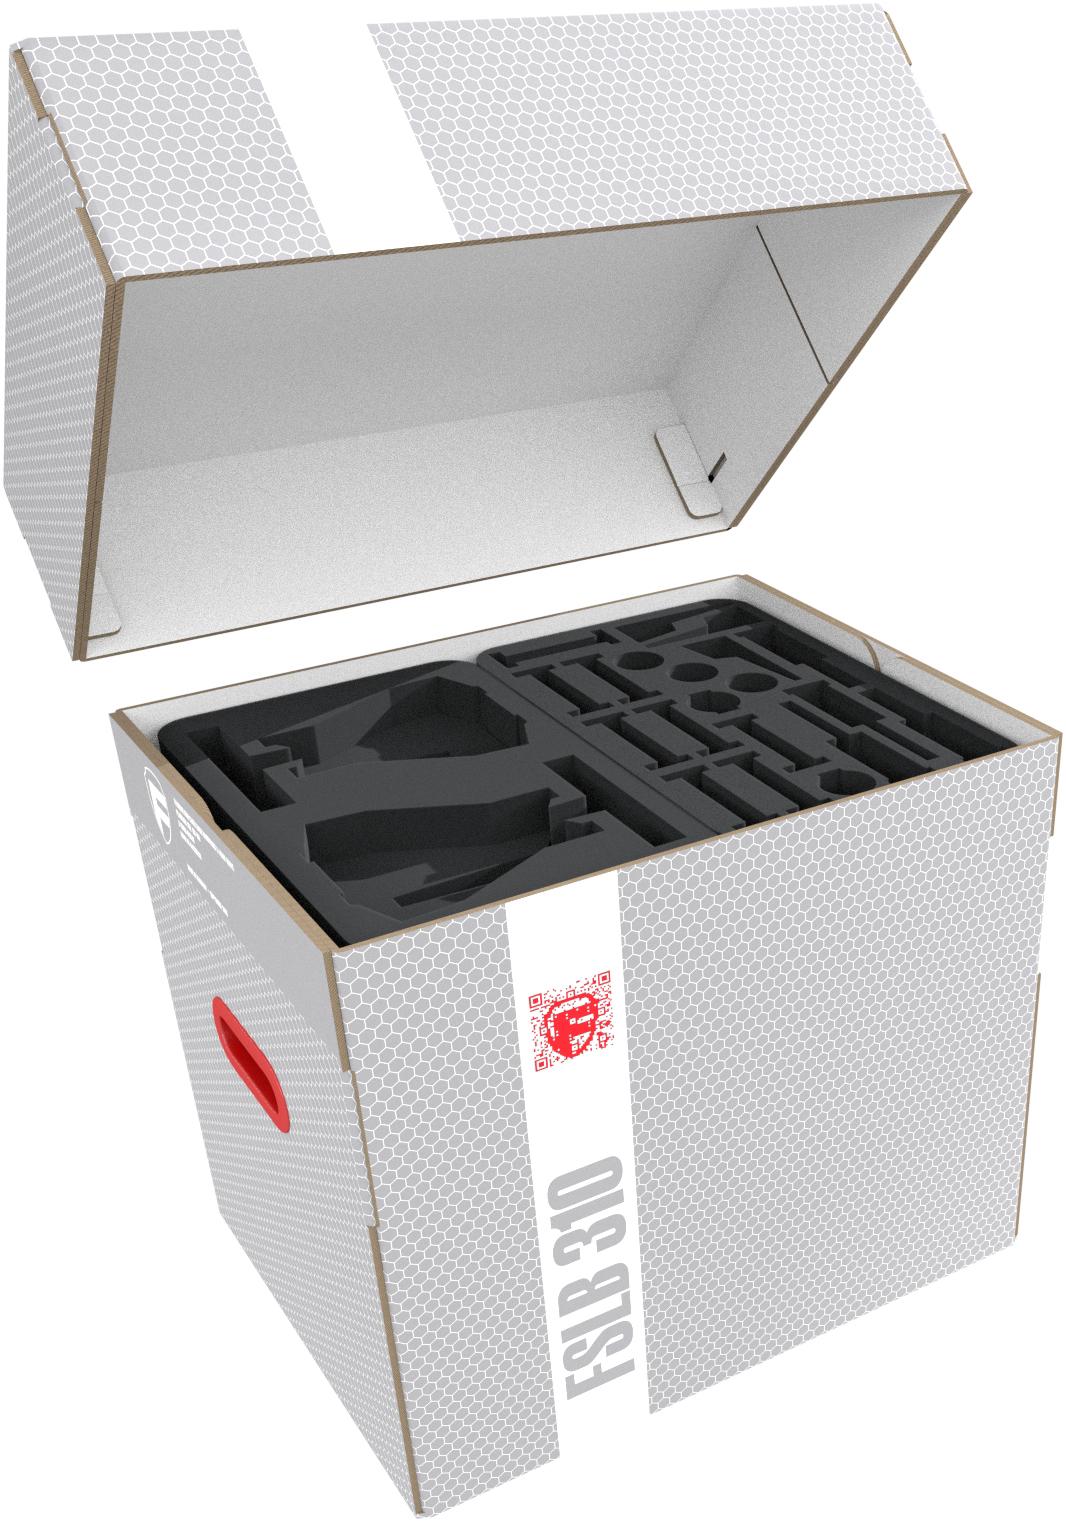 3186c35bd55c2 Feldherr Storage Box for Star Wars Legion – Rebels and Empire ...